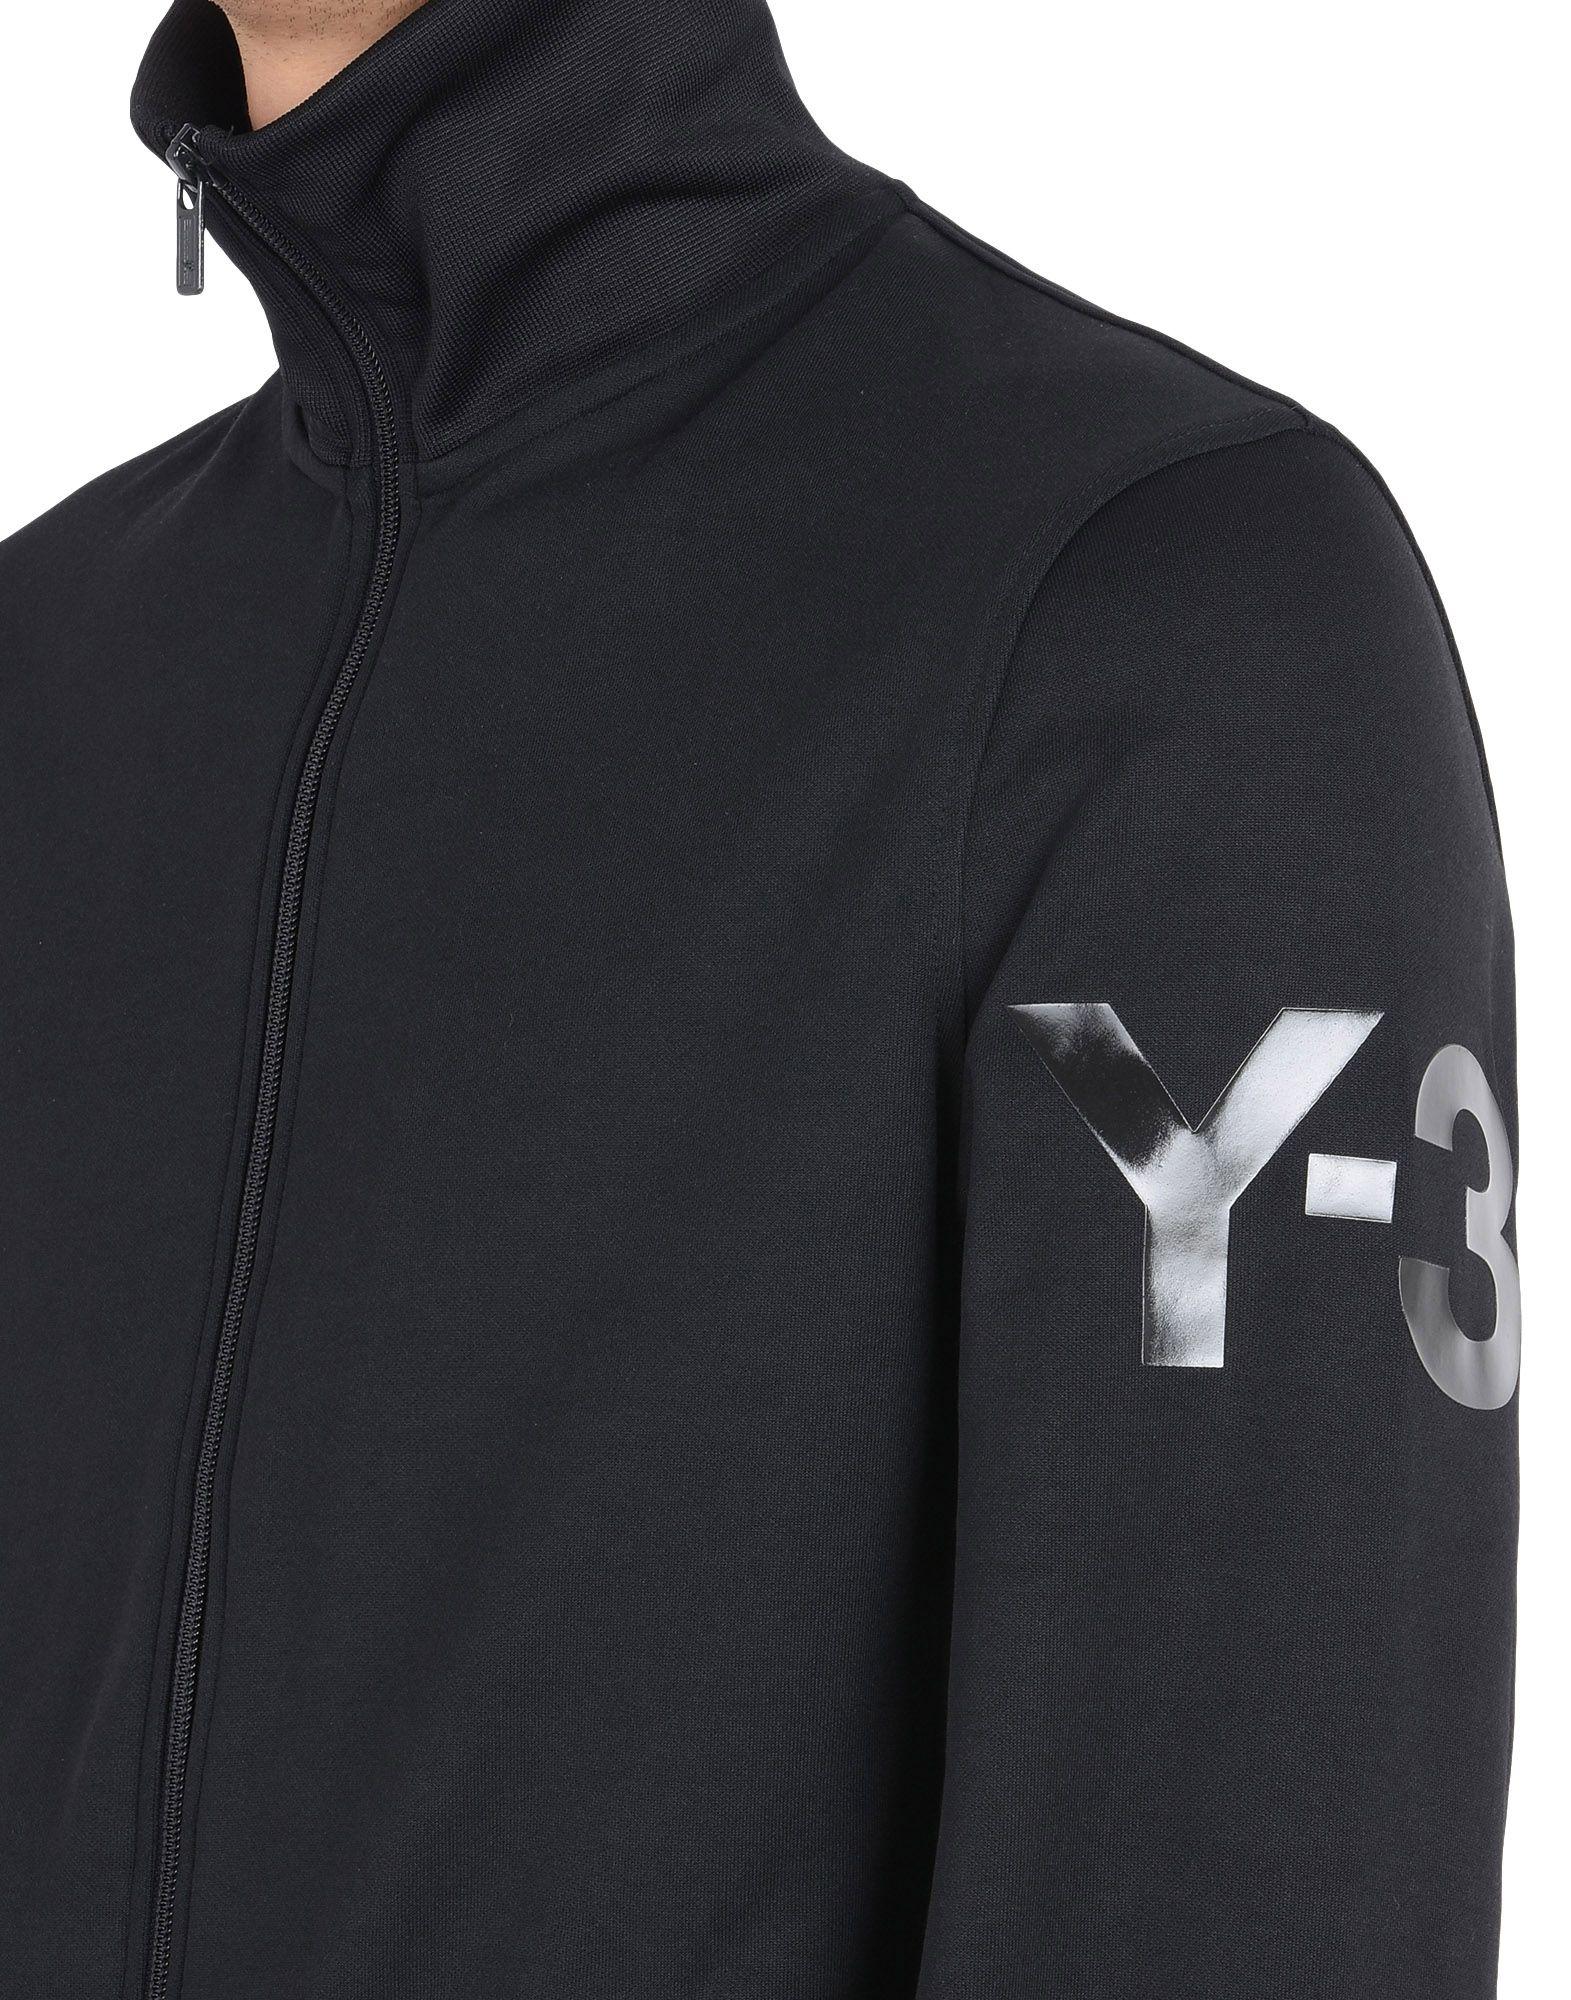 Y-3 Classic Track Top COATS & JACKETS man Y-3 adidas